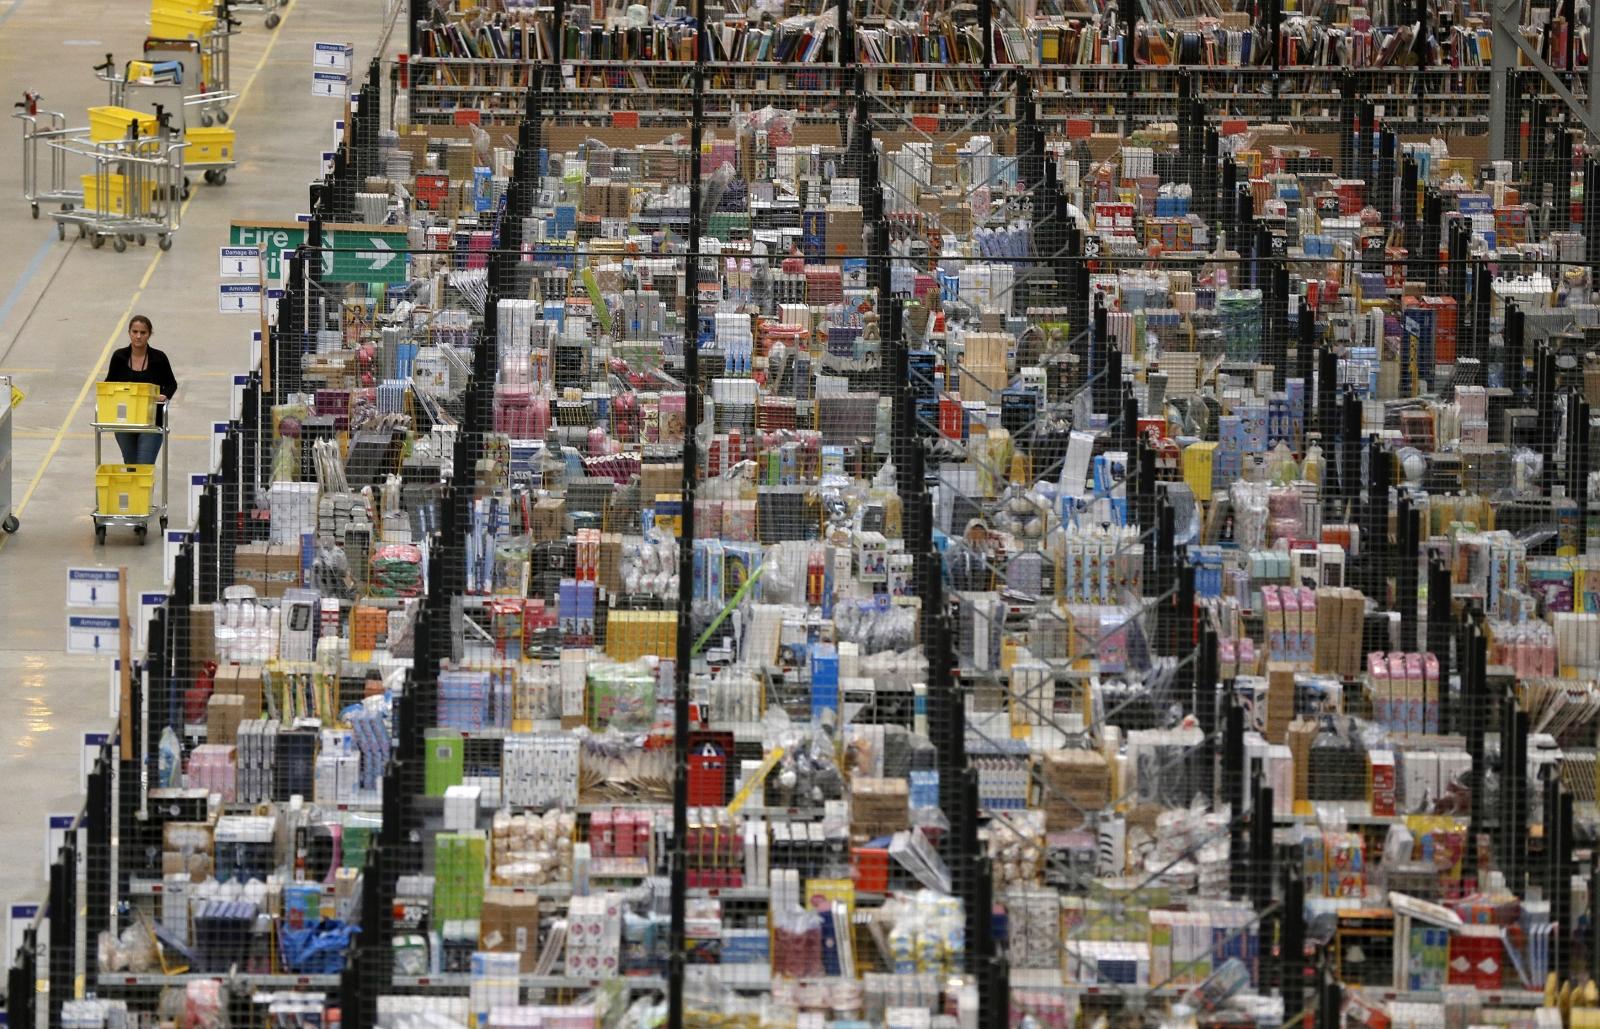 Amazon fulfilment centre in Peterborough